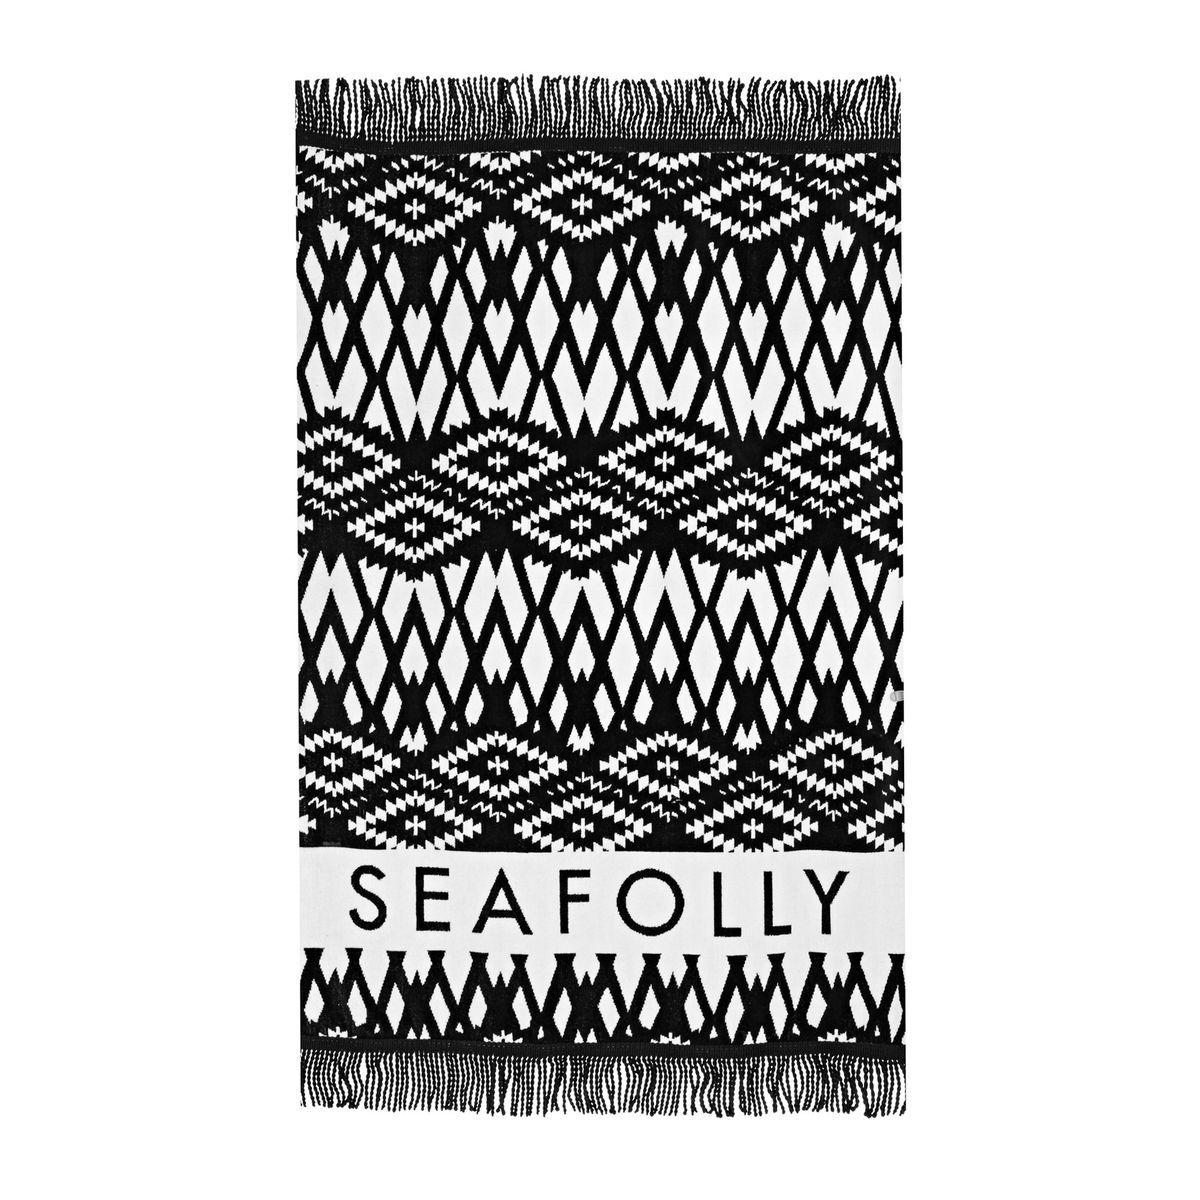 8af7501ef28 Seafolly Towels - Seafolly Fringe Benefits Persian Towel - Black/White